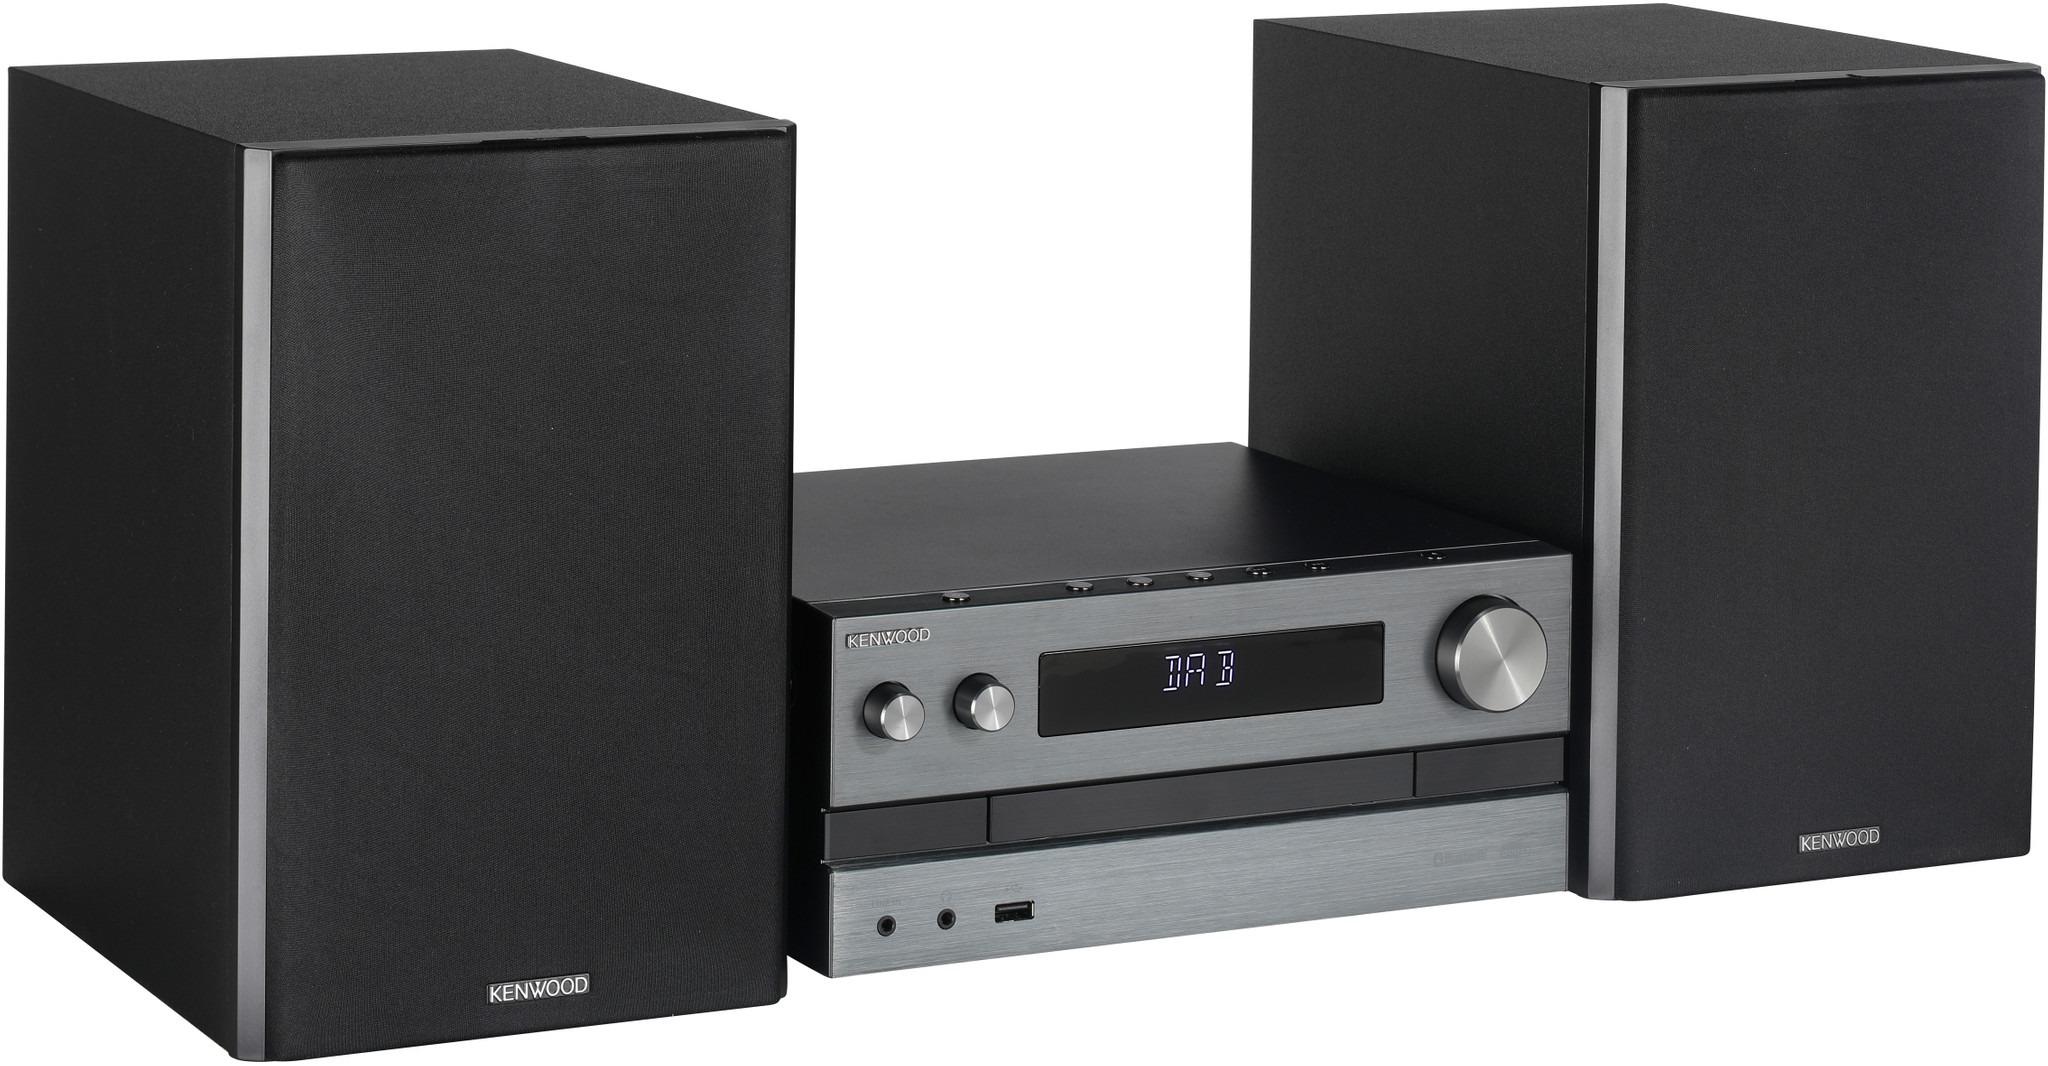 Kenwood M918DAB stereo set